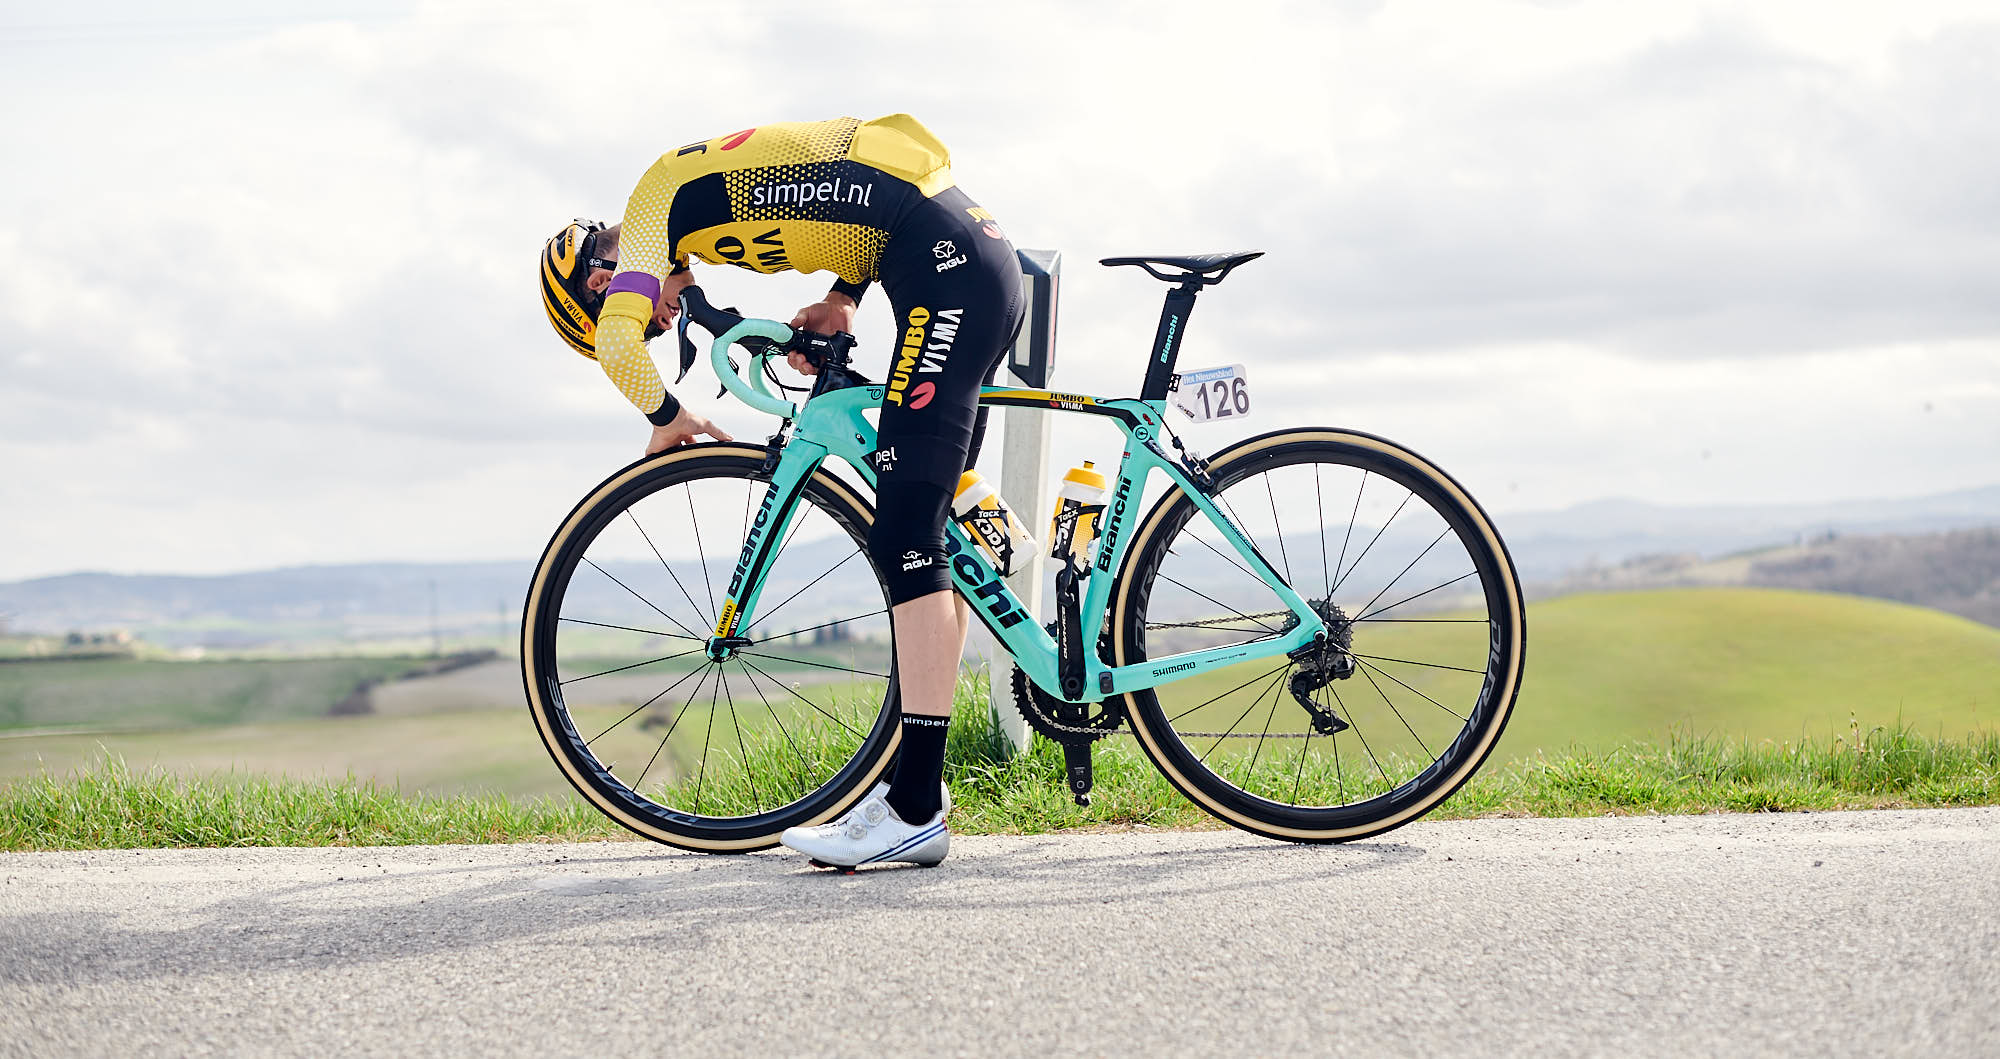 Floris de Tier checking tire pressure on his Bianchi